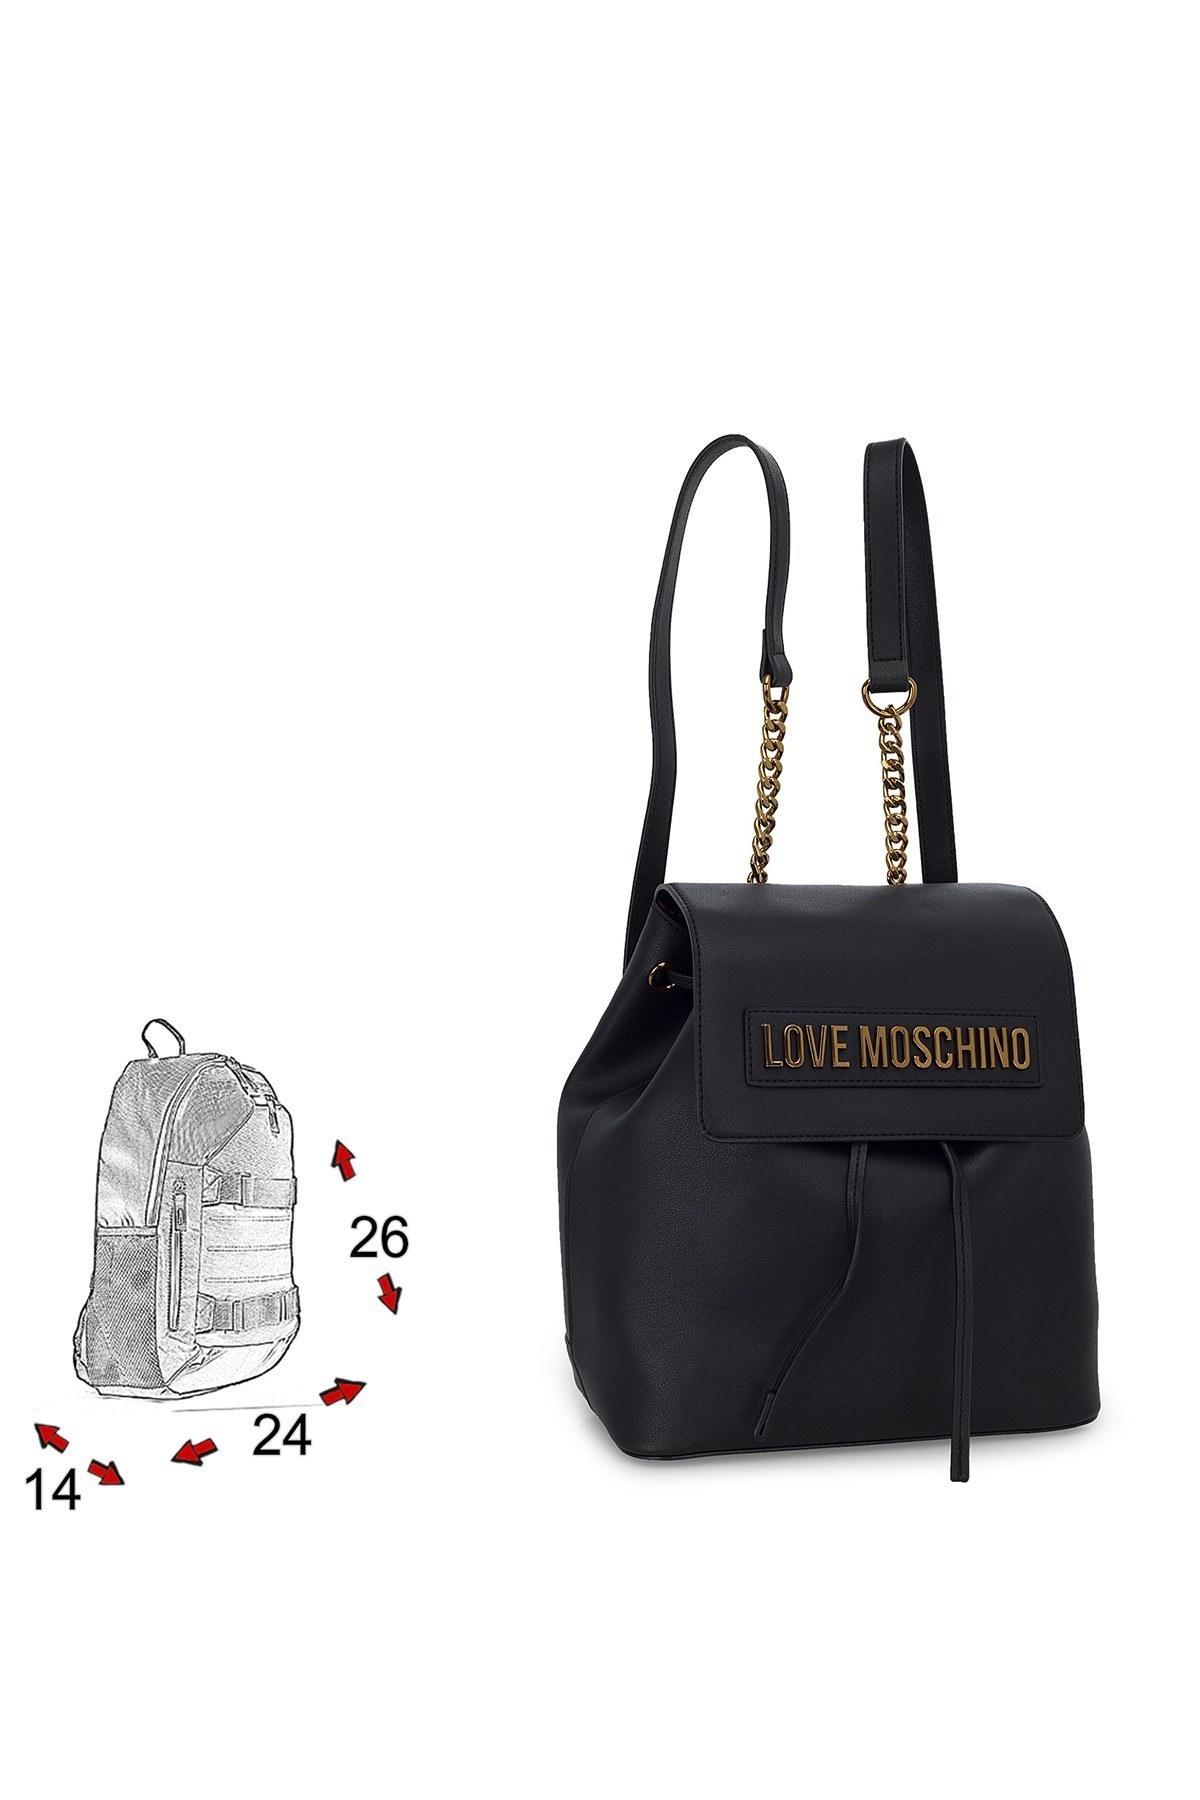 Love Moschino Logo Baskılı Zincir Detaylı Kadın Çanta JC4069PP1BLK0000 SİYAH